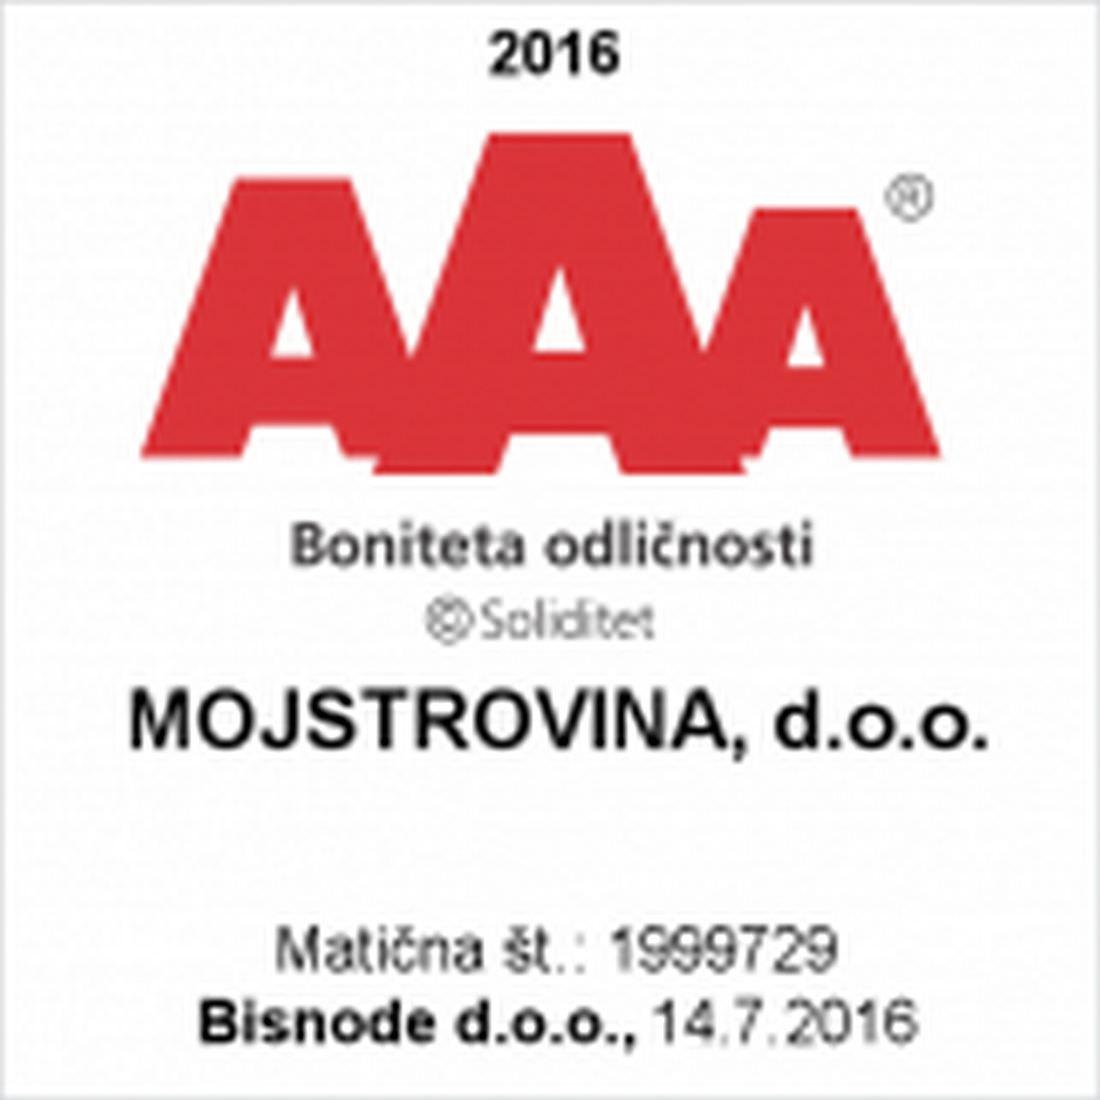 Certifikat bonitetne odličnosti AAA